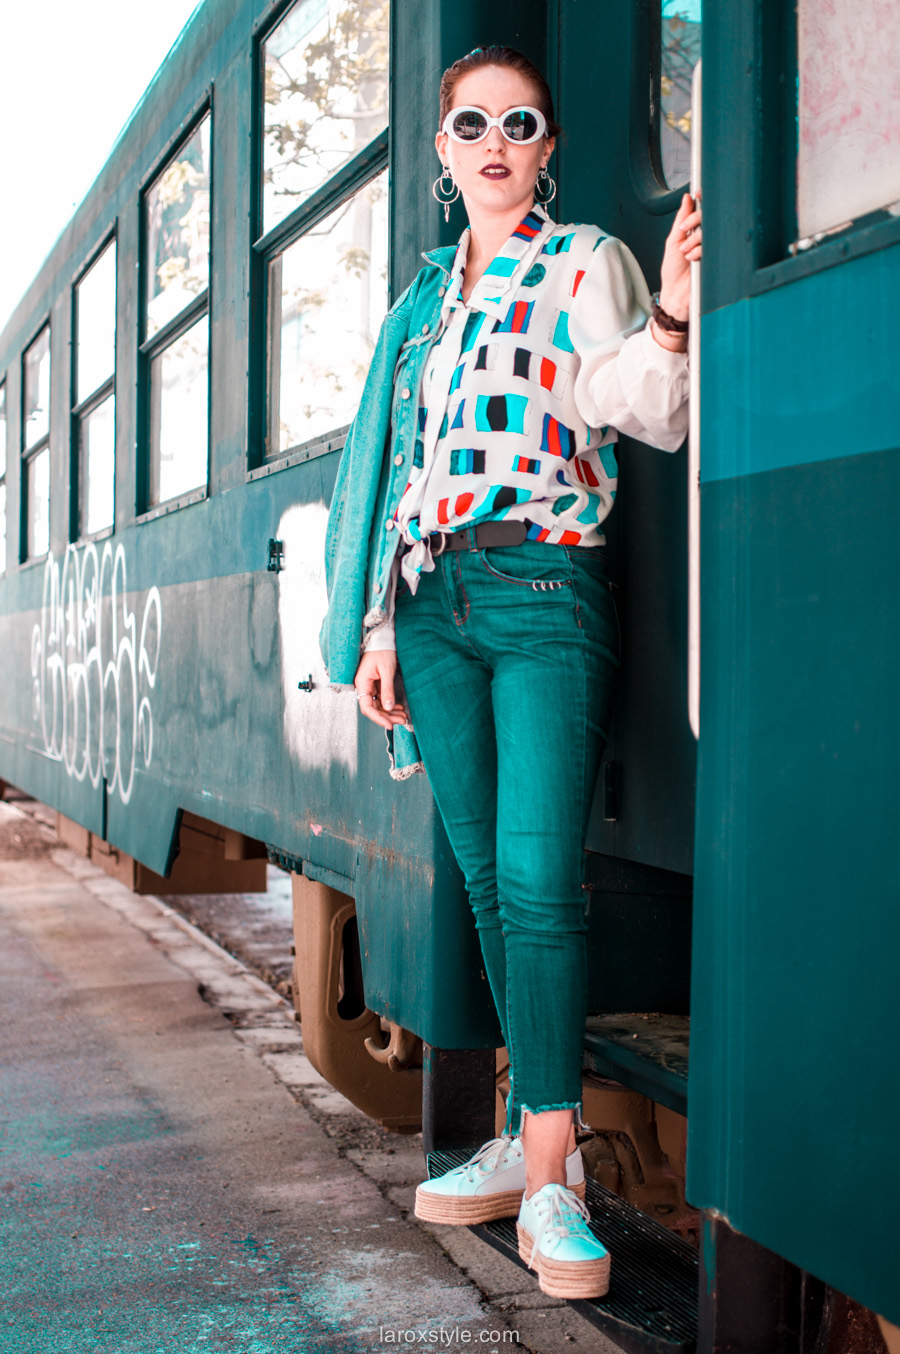 chemise oversize et jean slim - shooting mode wagon